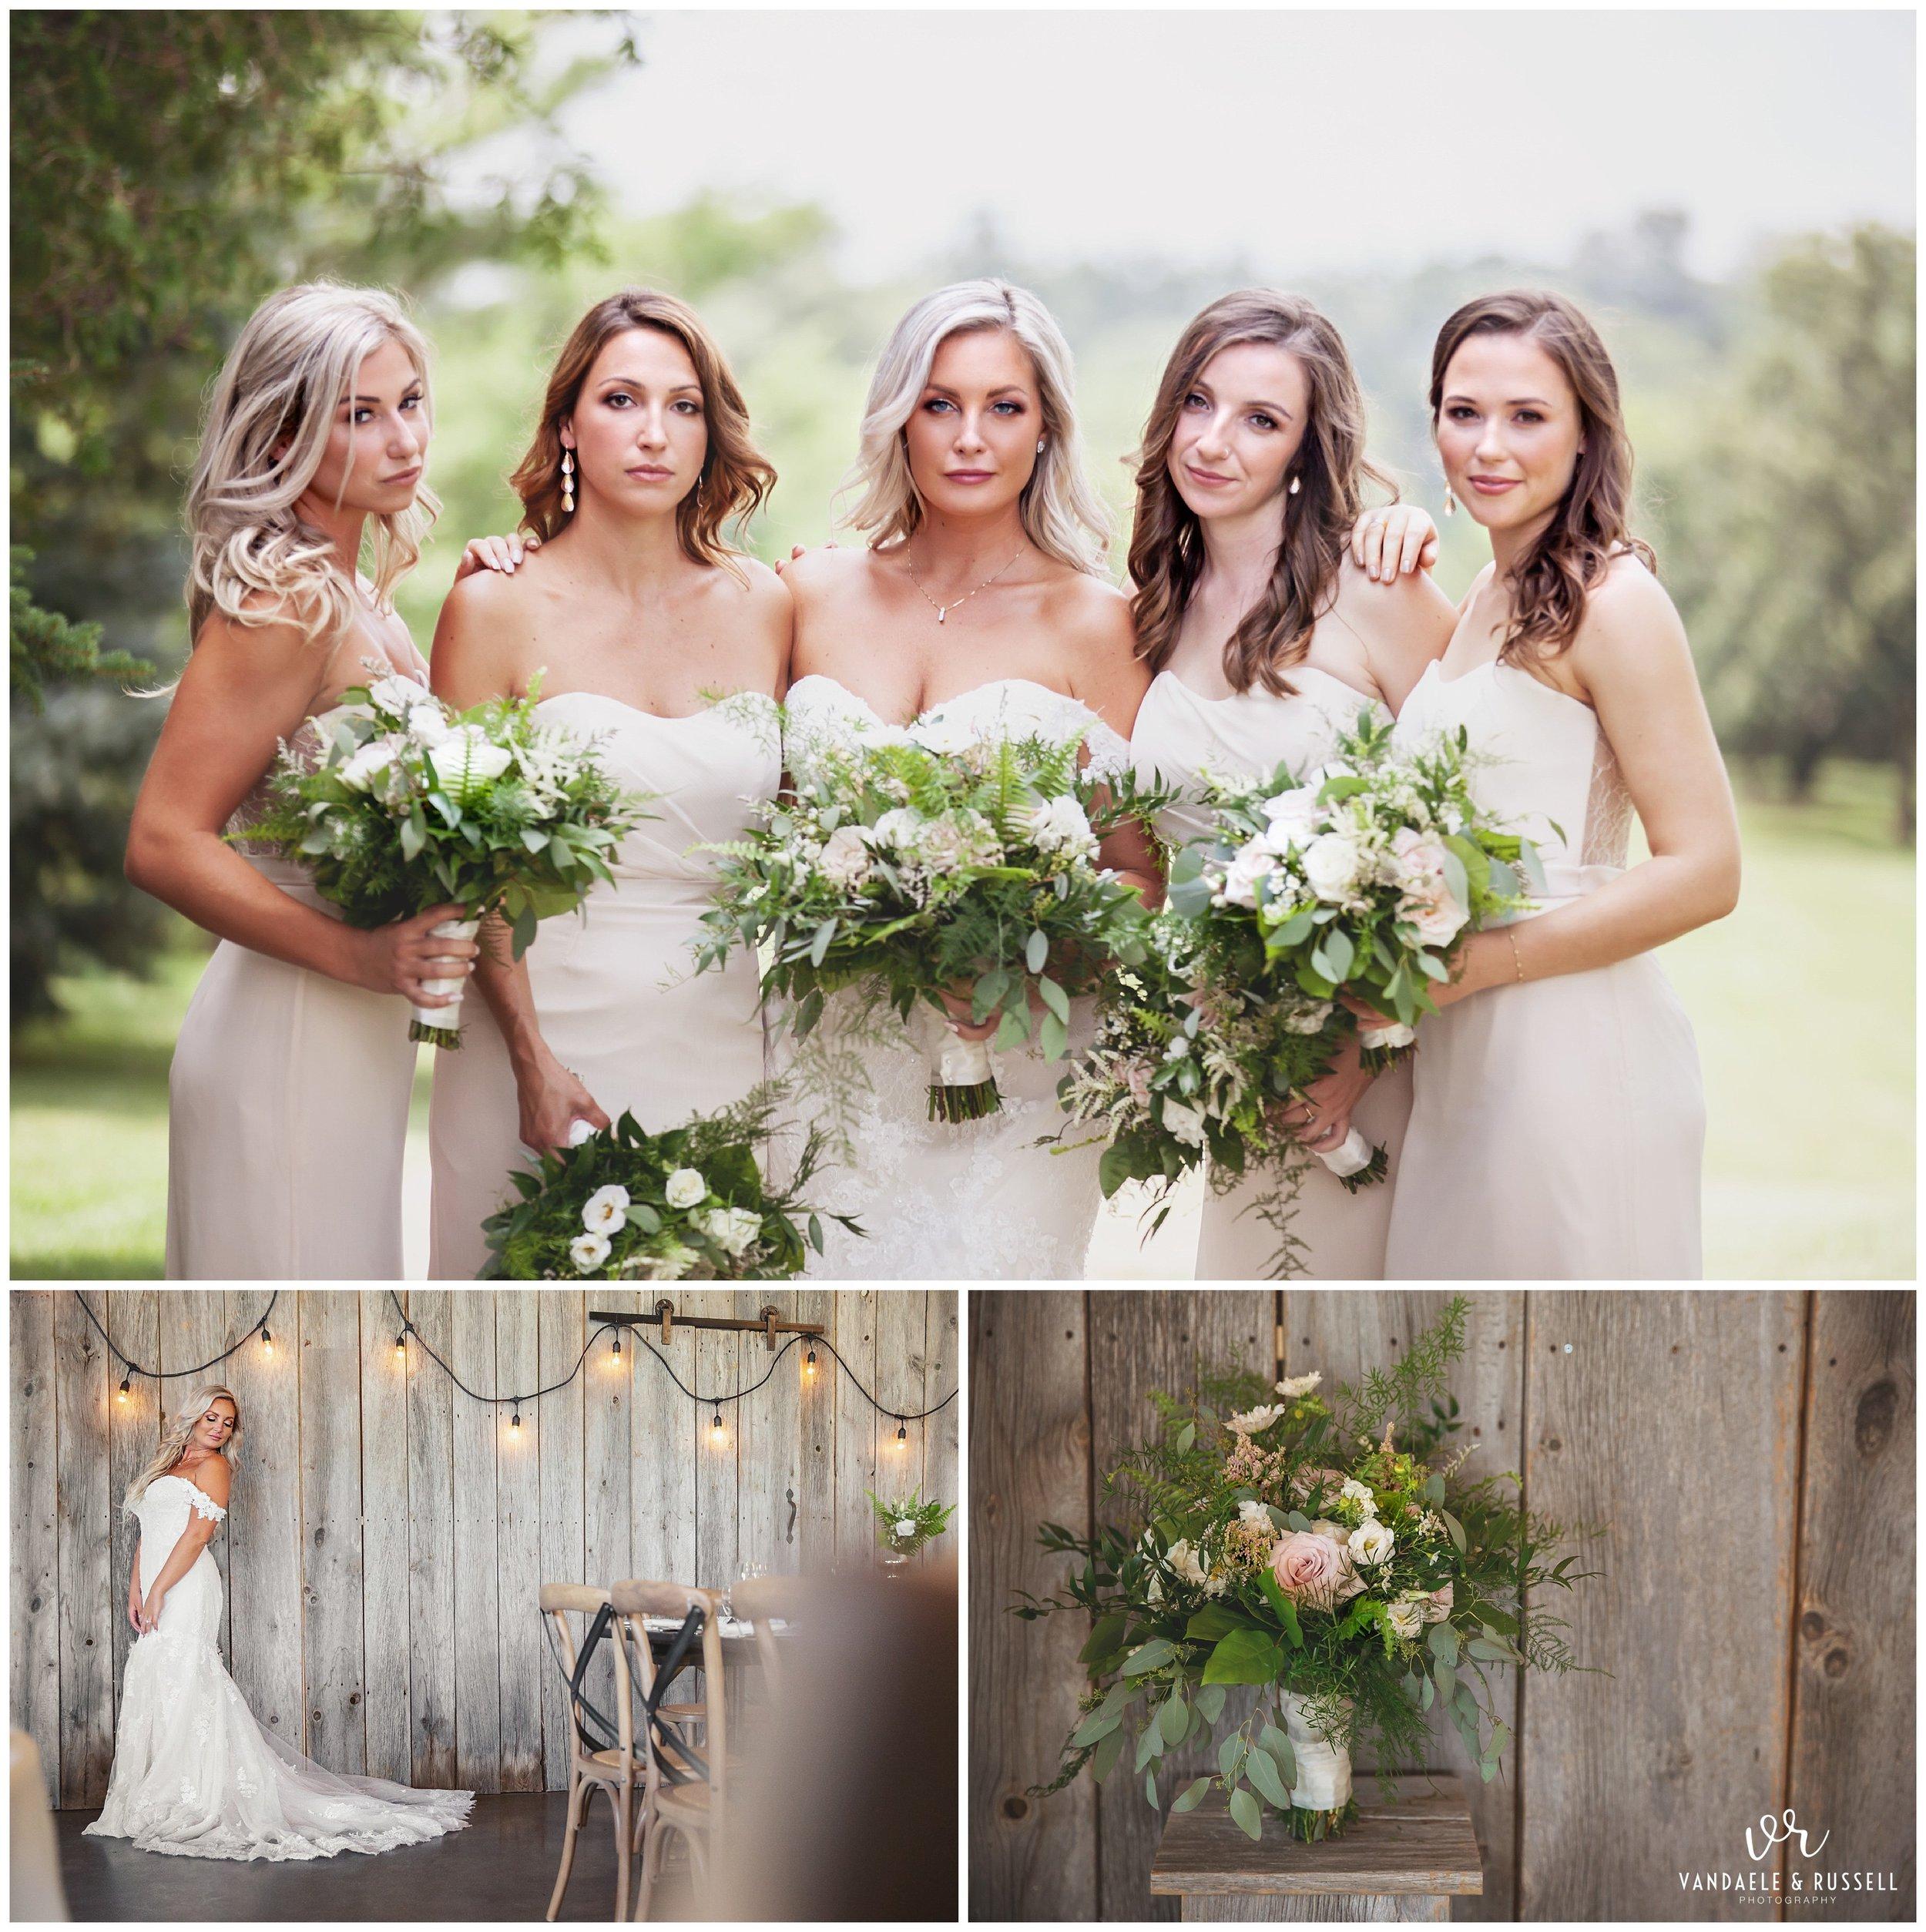 VanDaele-Russell-Wedding-Photography-London-Toronto-Ontario_0155.jpg